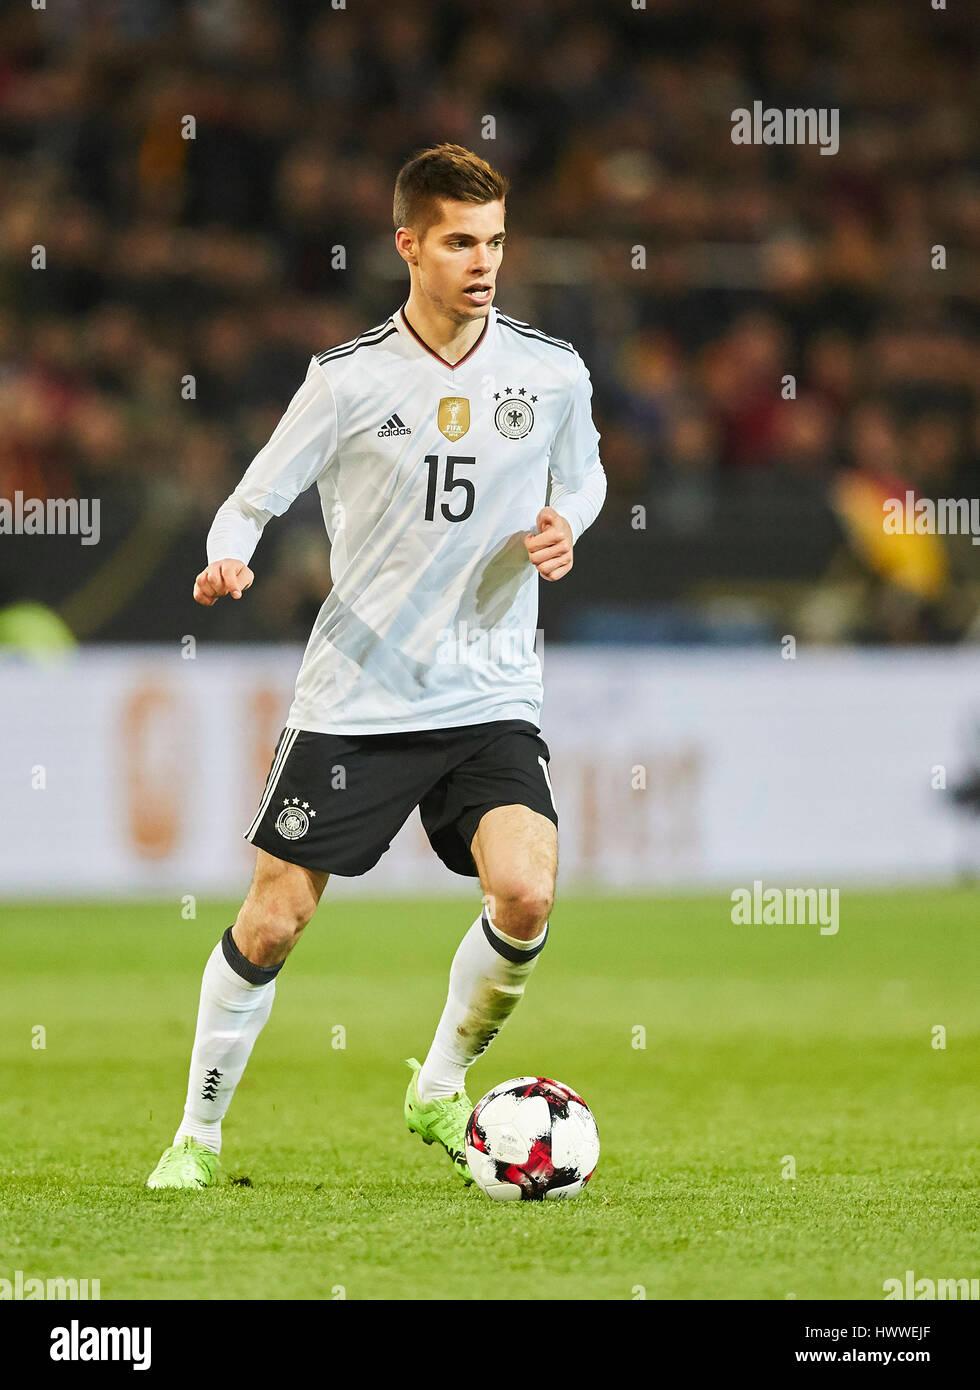 Dortmund Germany 22nd Mar 2017 Julian WEIGL DFB 15 drives the